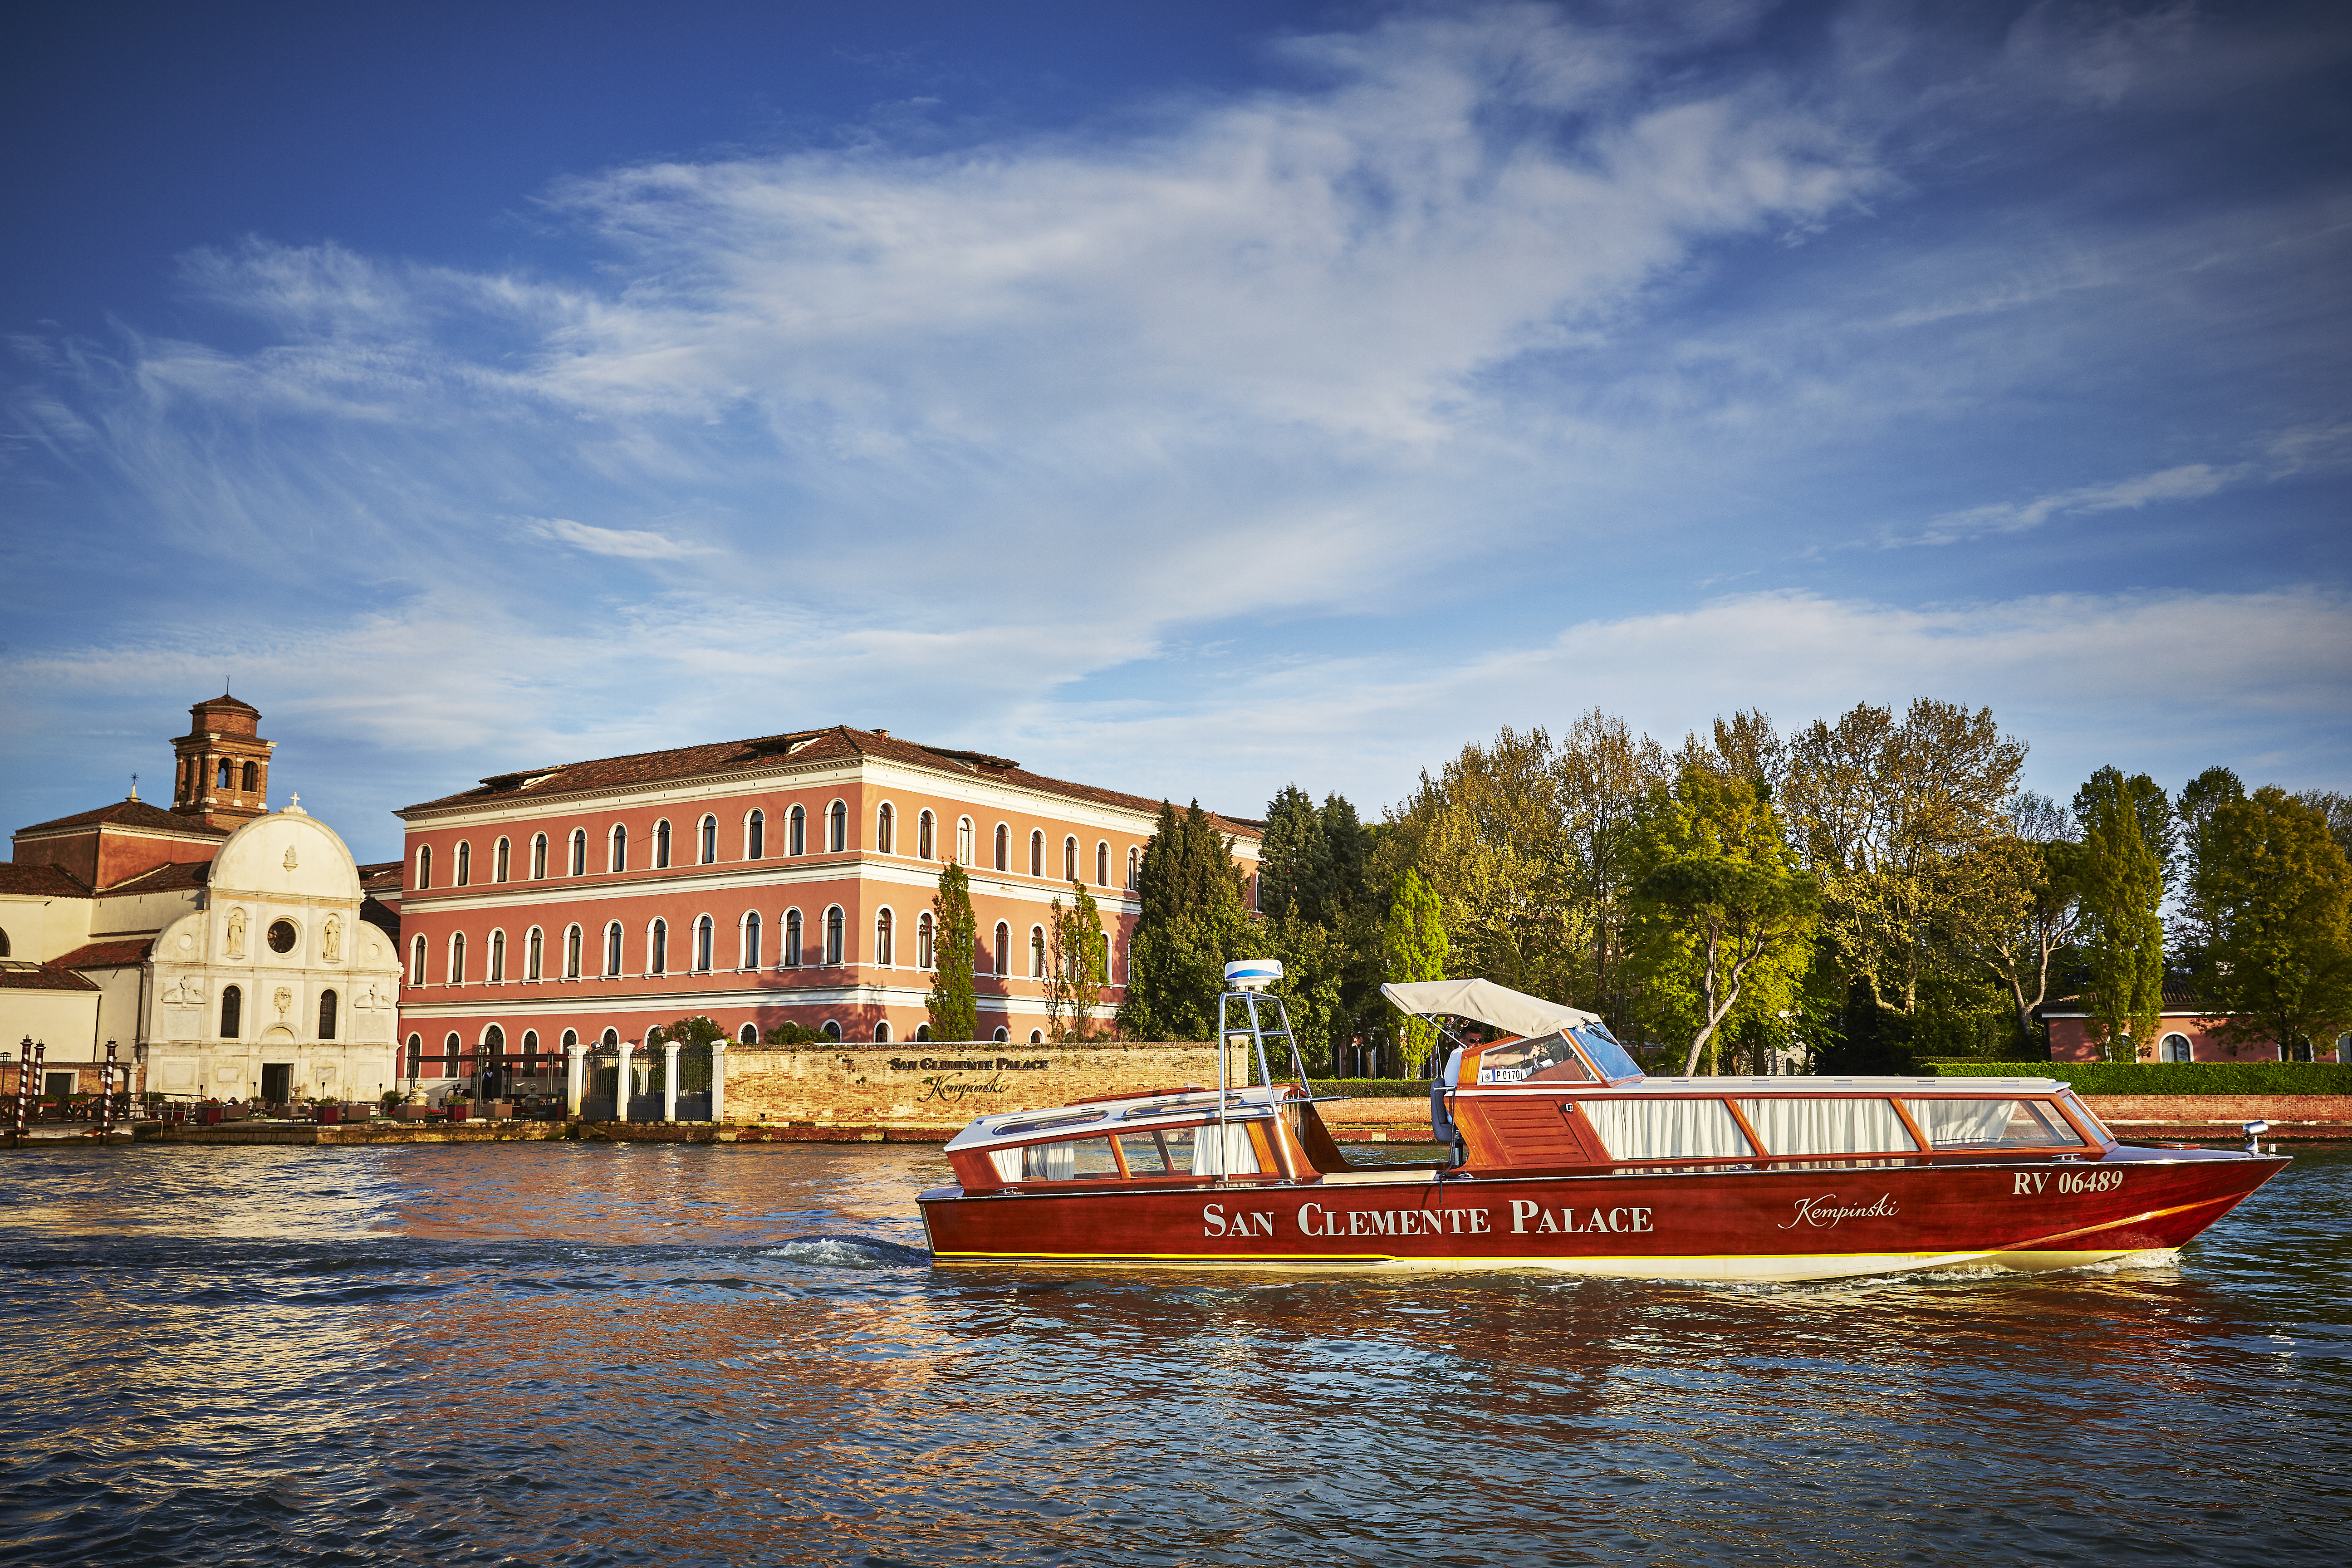 Kempinski Venice_Official hotel image_2016